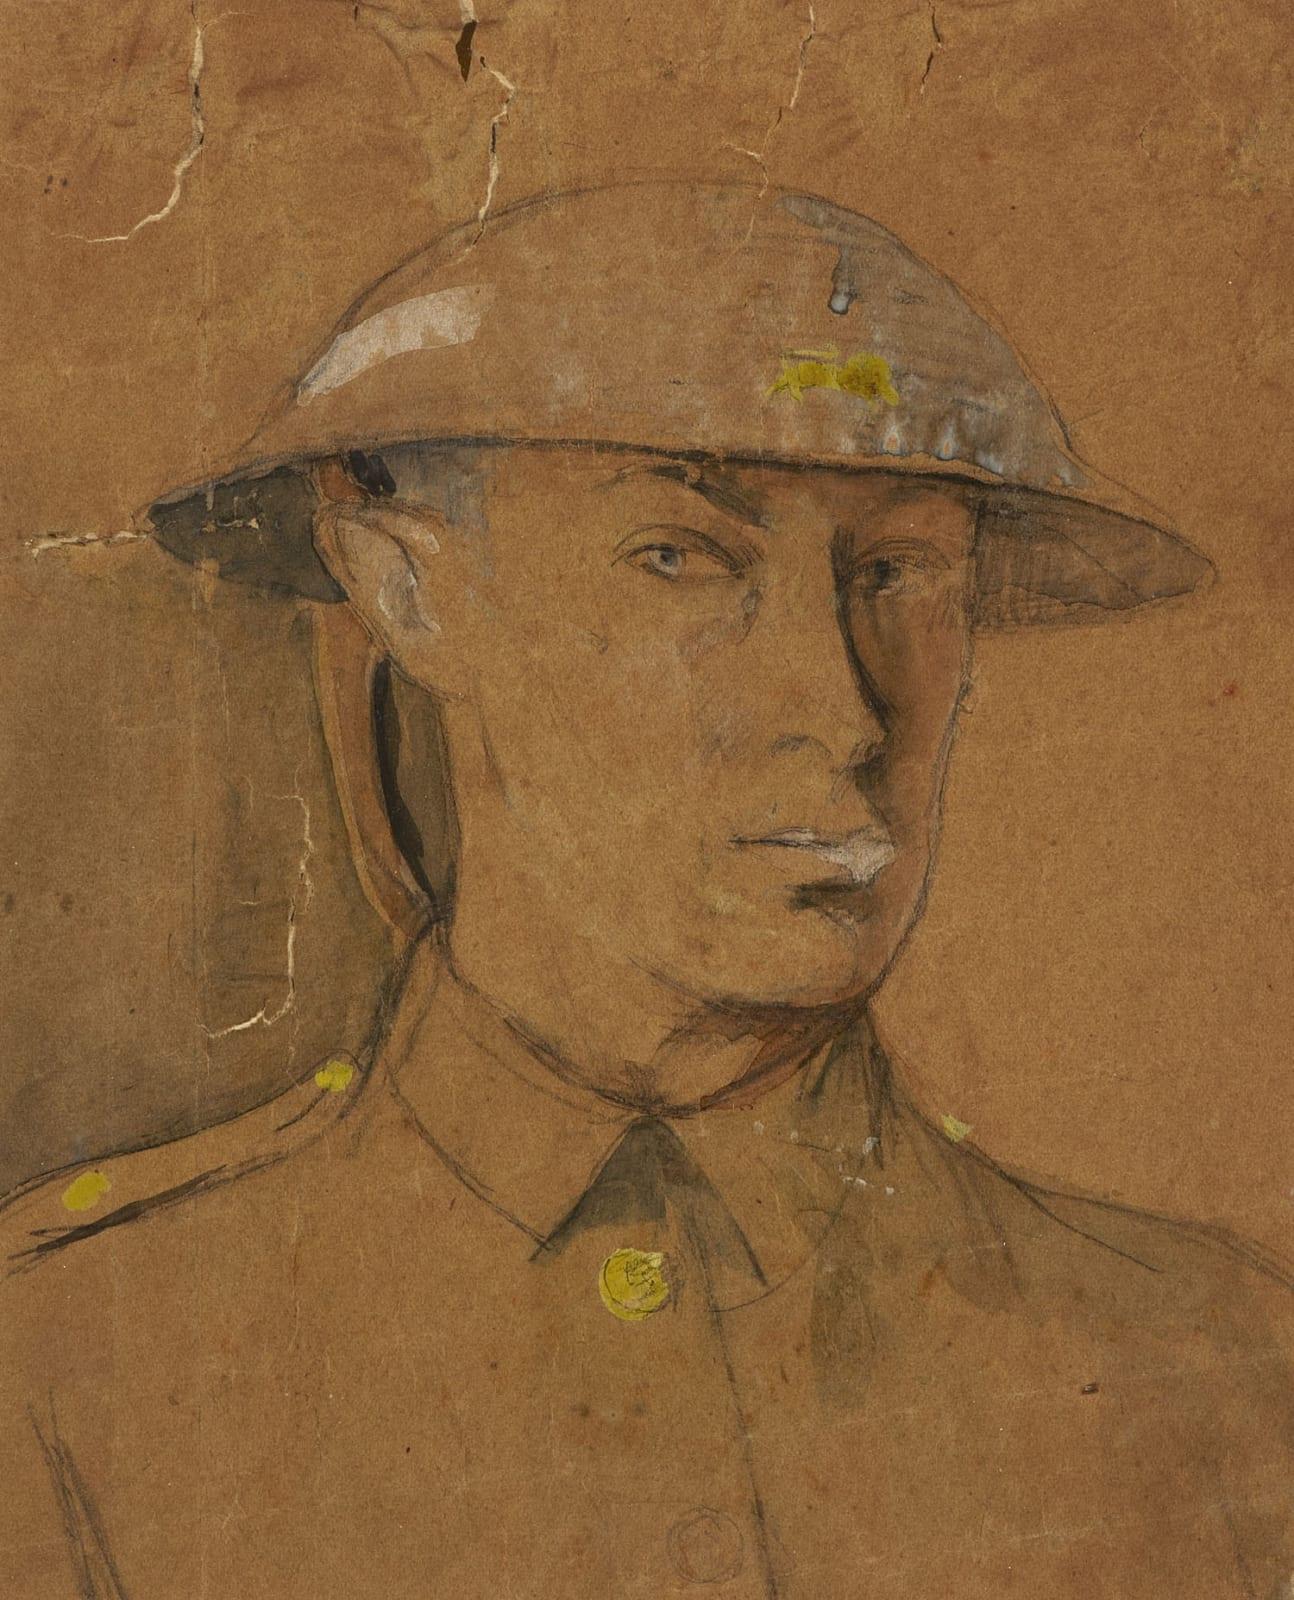 Isaac Rosenberg (1890-1918) Self Portrait in Steel Helmet 1916 Black chalk, gouache and wash on paper 22.4 x 19.6 cm Ben Uri Collection